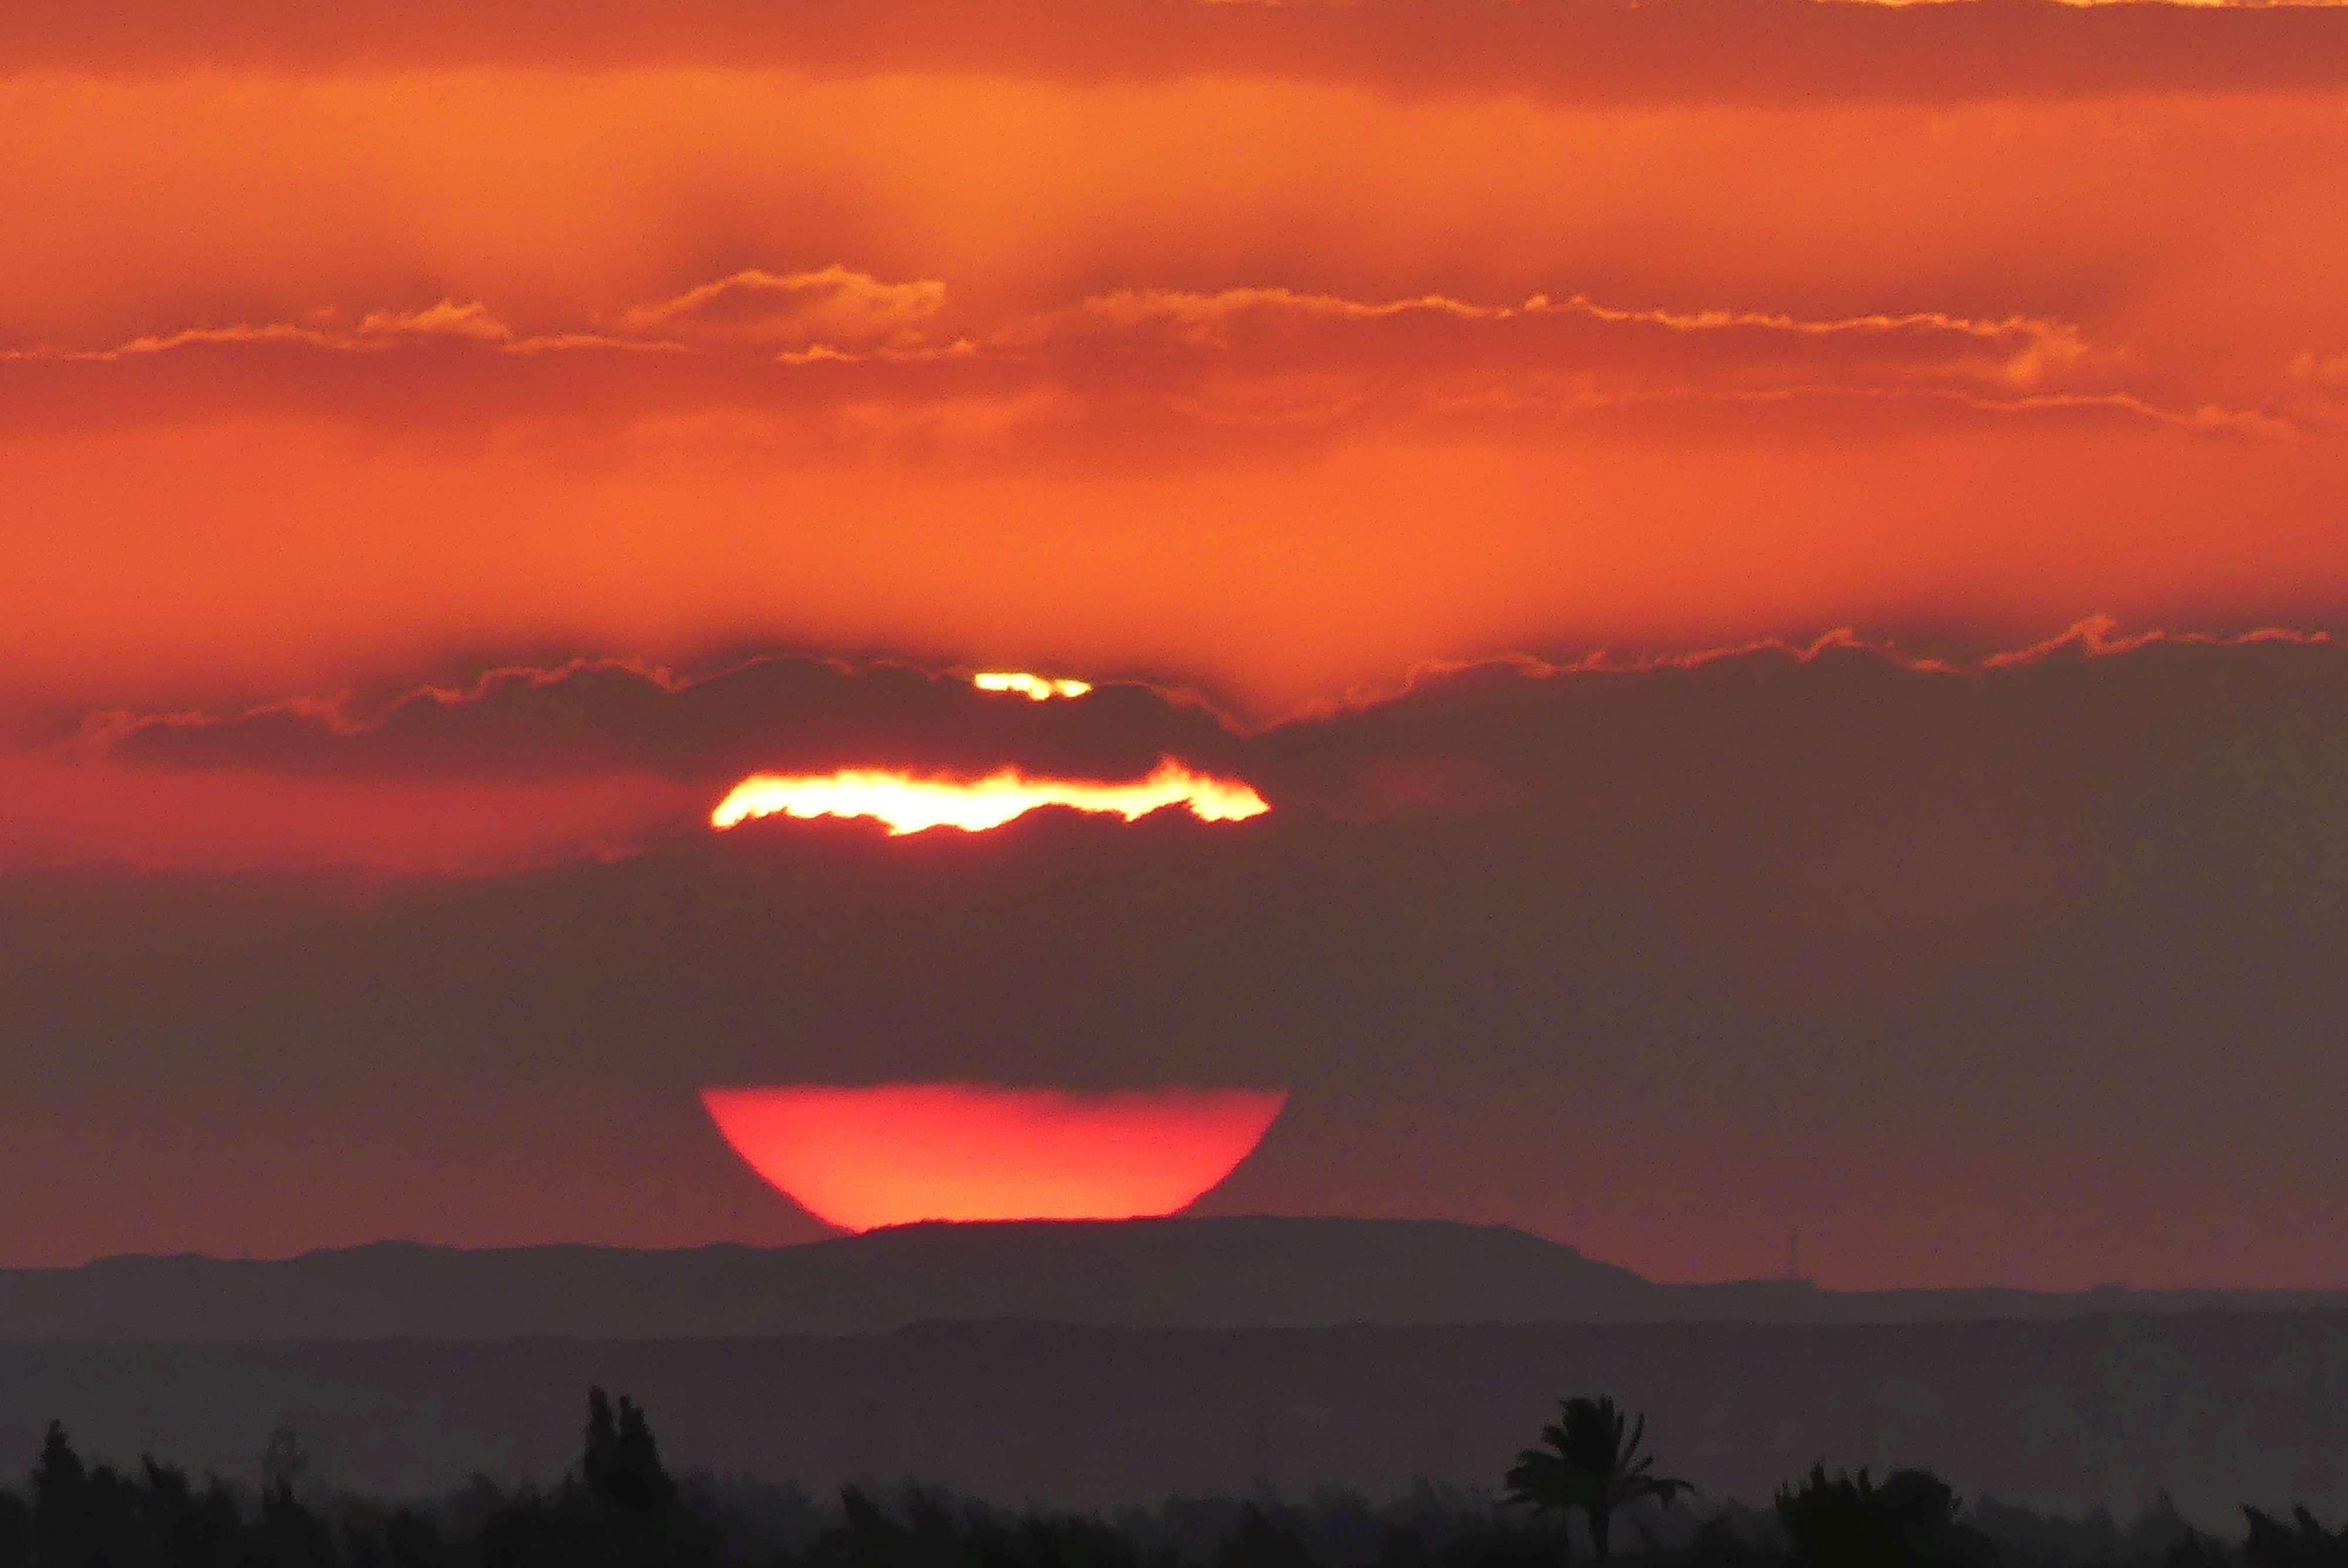 Sonnenuntergang am Roten Meer. Foto: Bernd Kregel